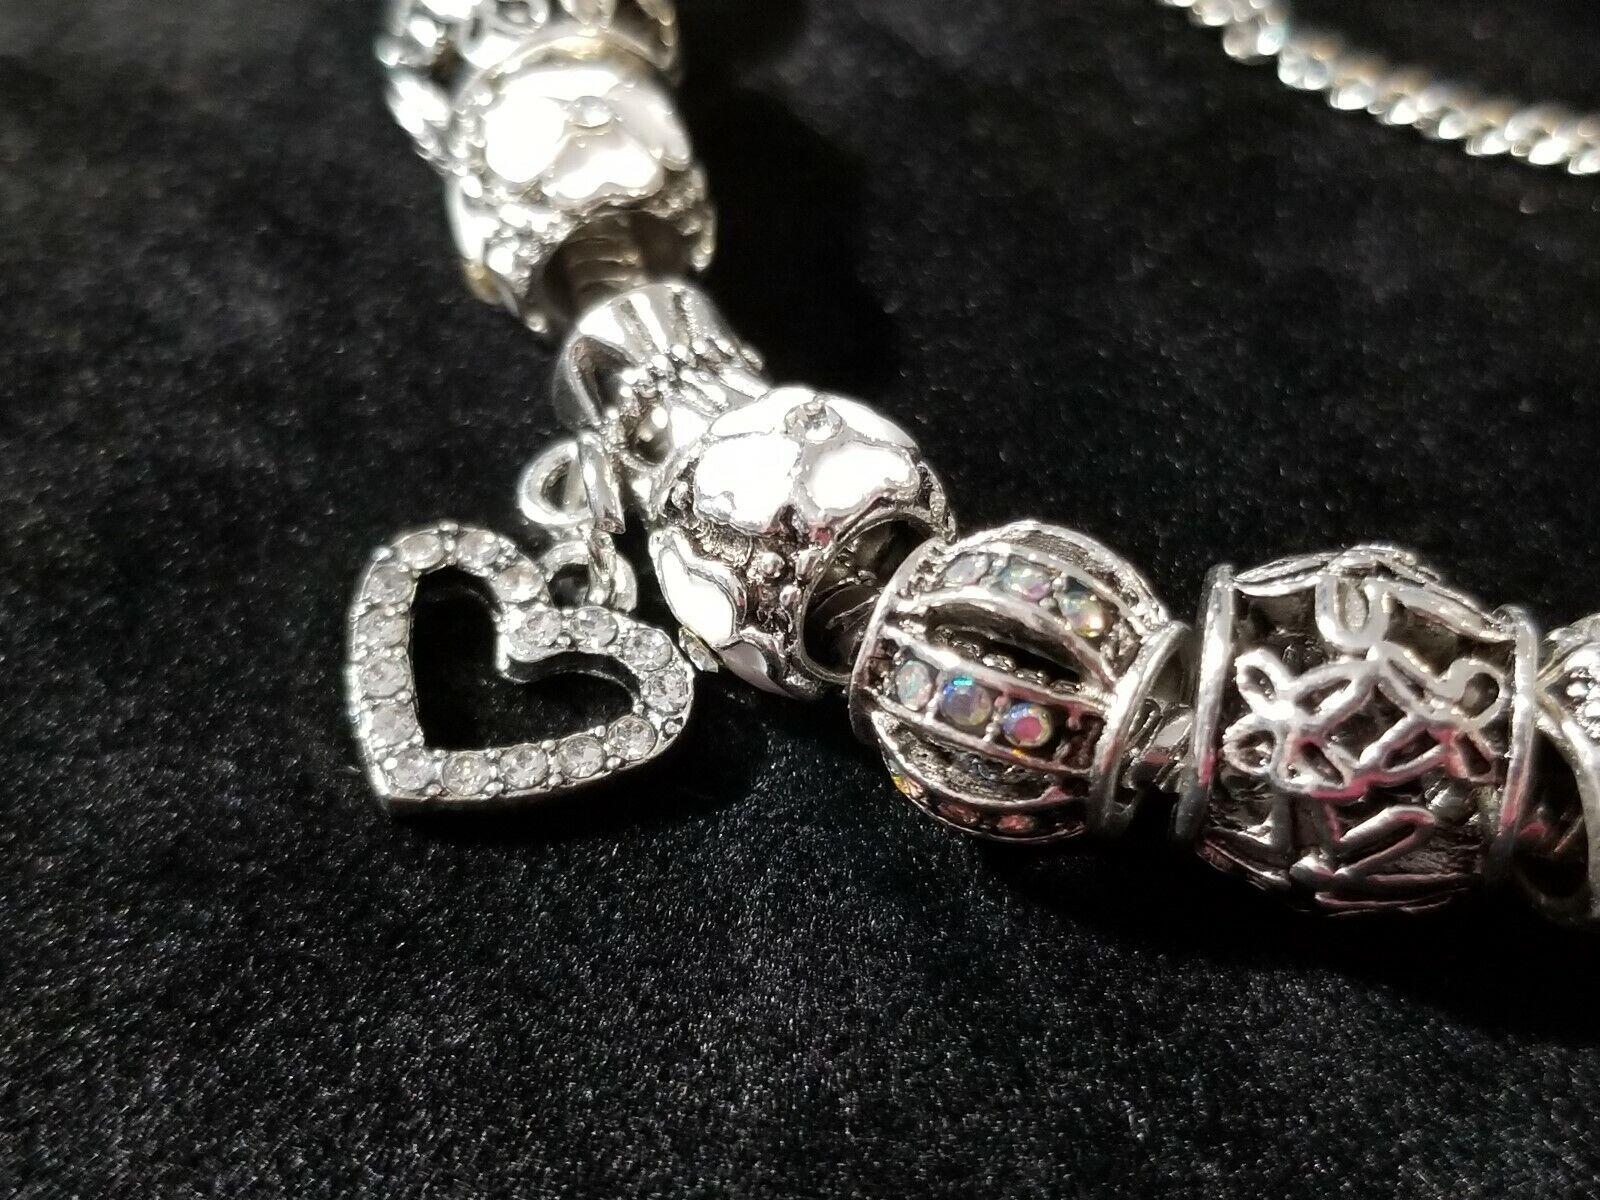 Women's 18K Charm Bracelet with Swarovski  Elements- White gold Plated No. 7957